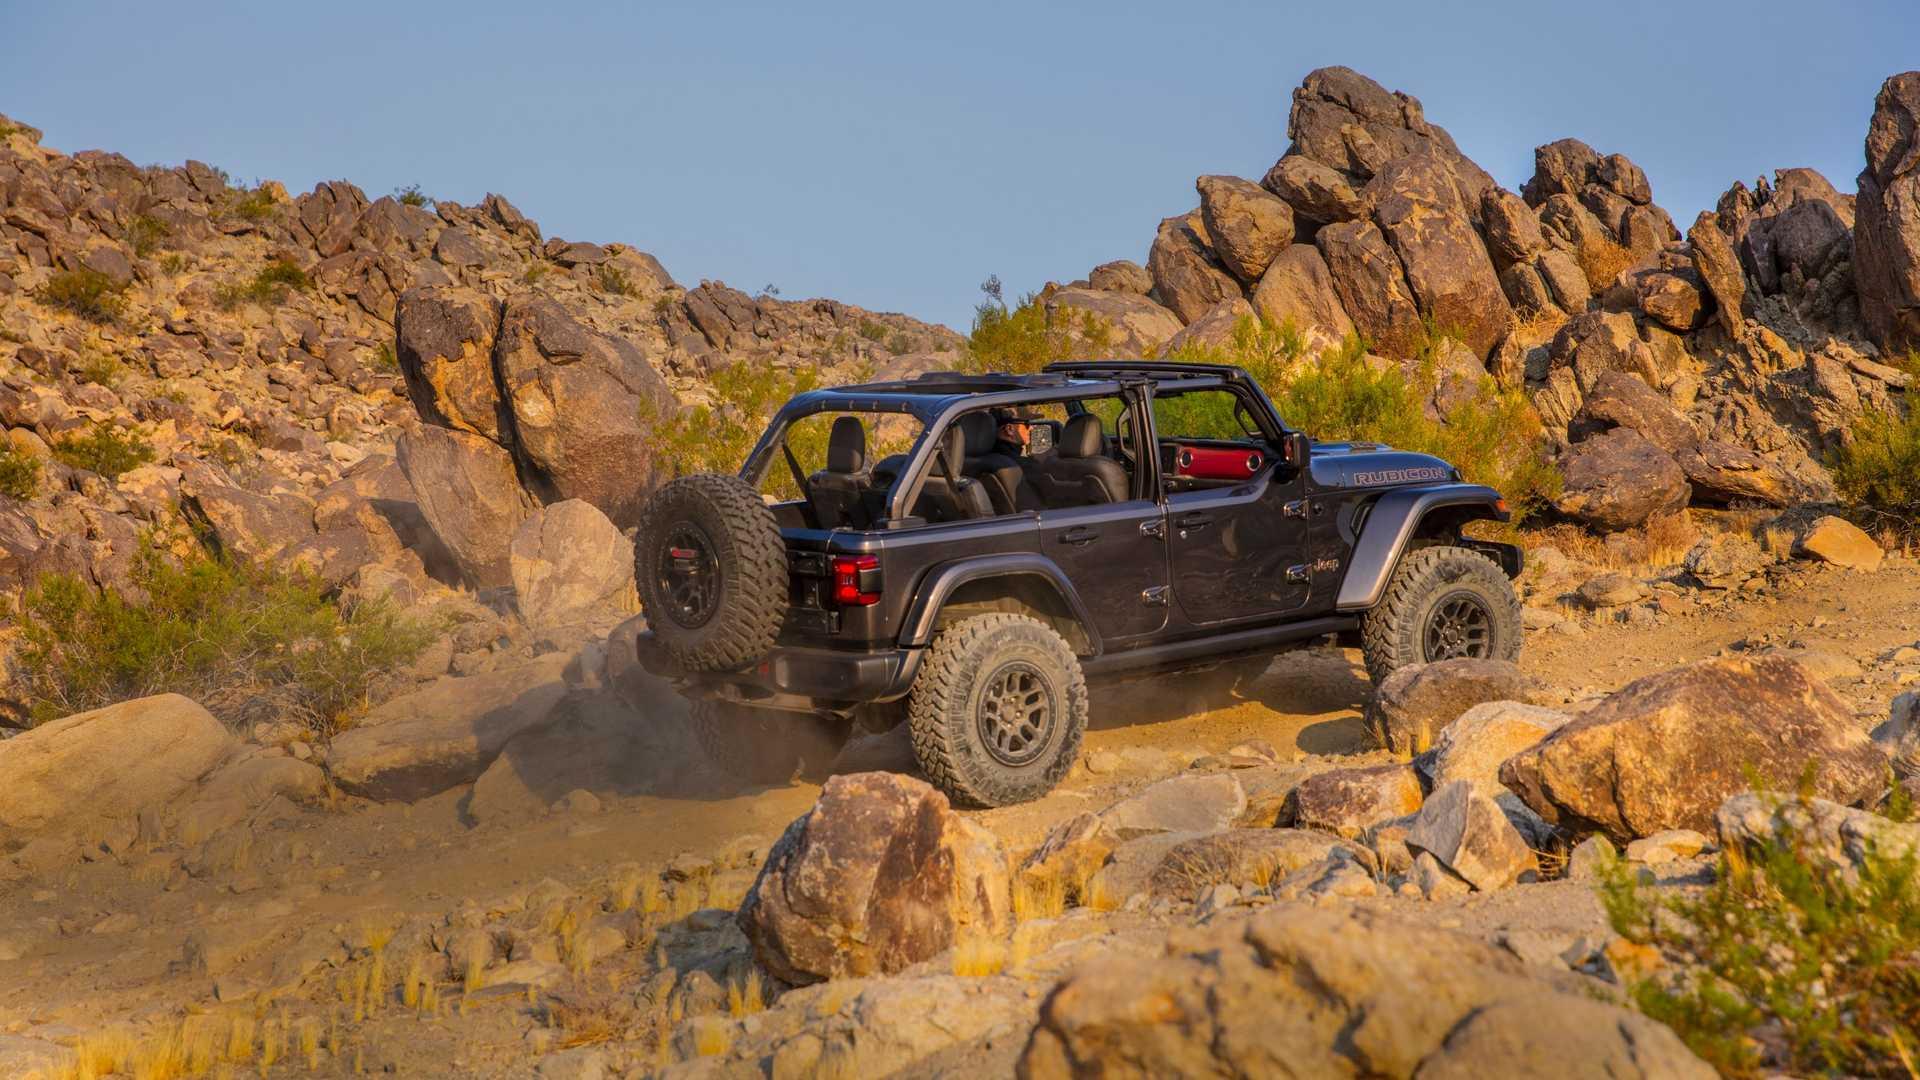 2021-jeep-wrangler-rubicon-392-side-view-11